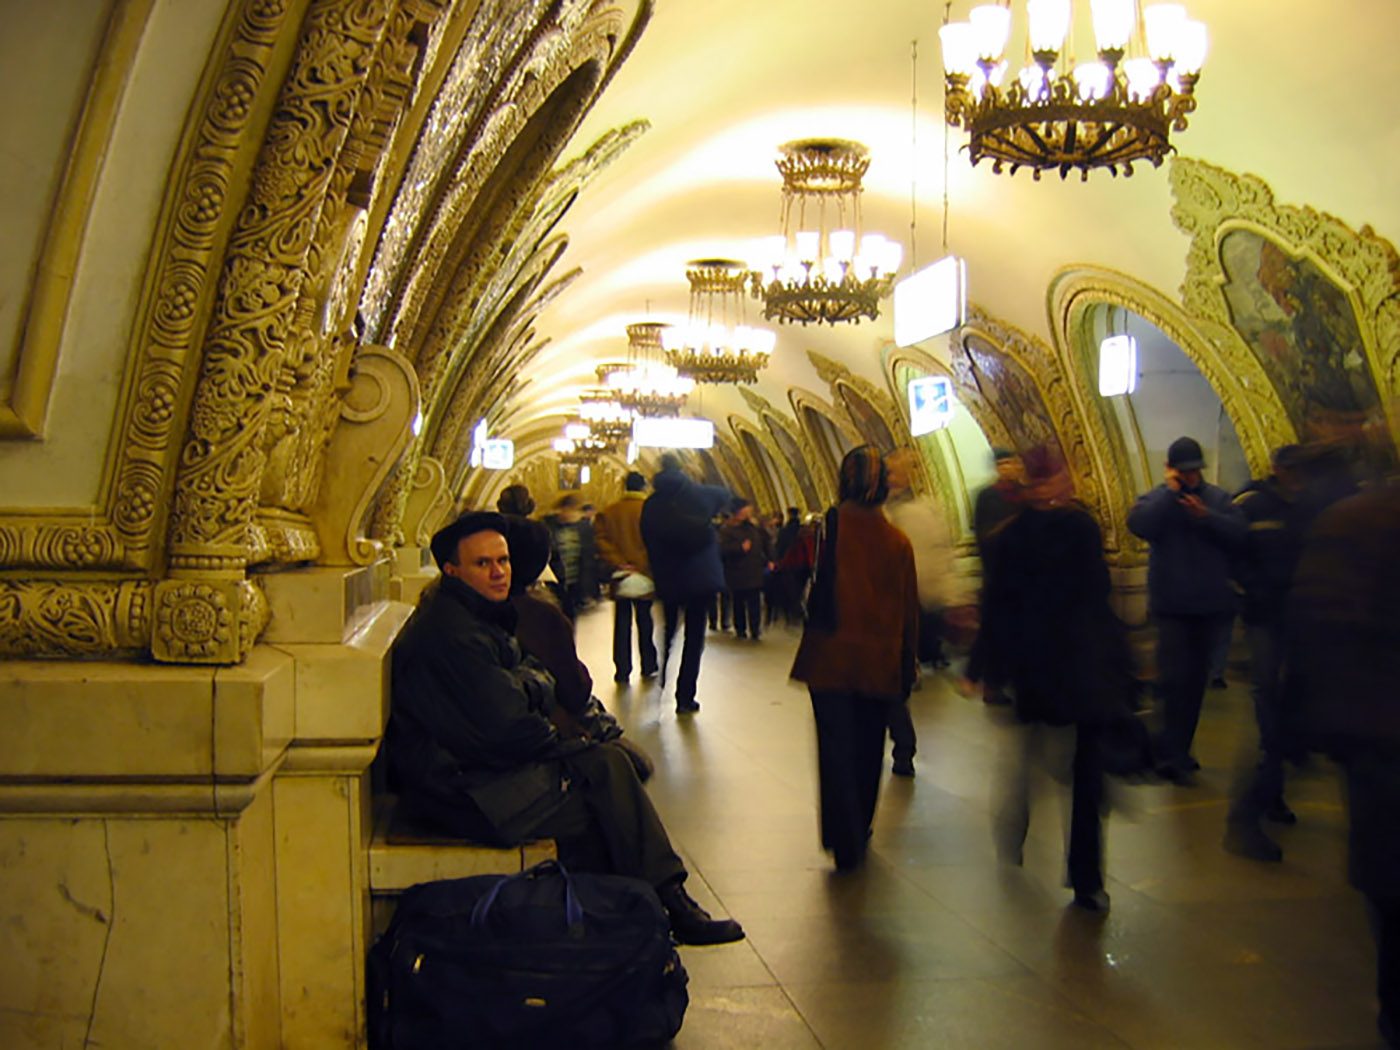 MetrostationKievskaya